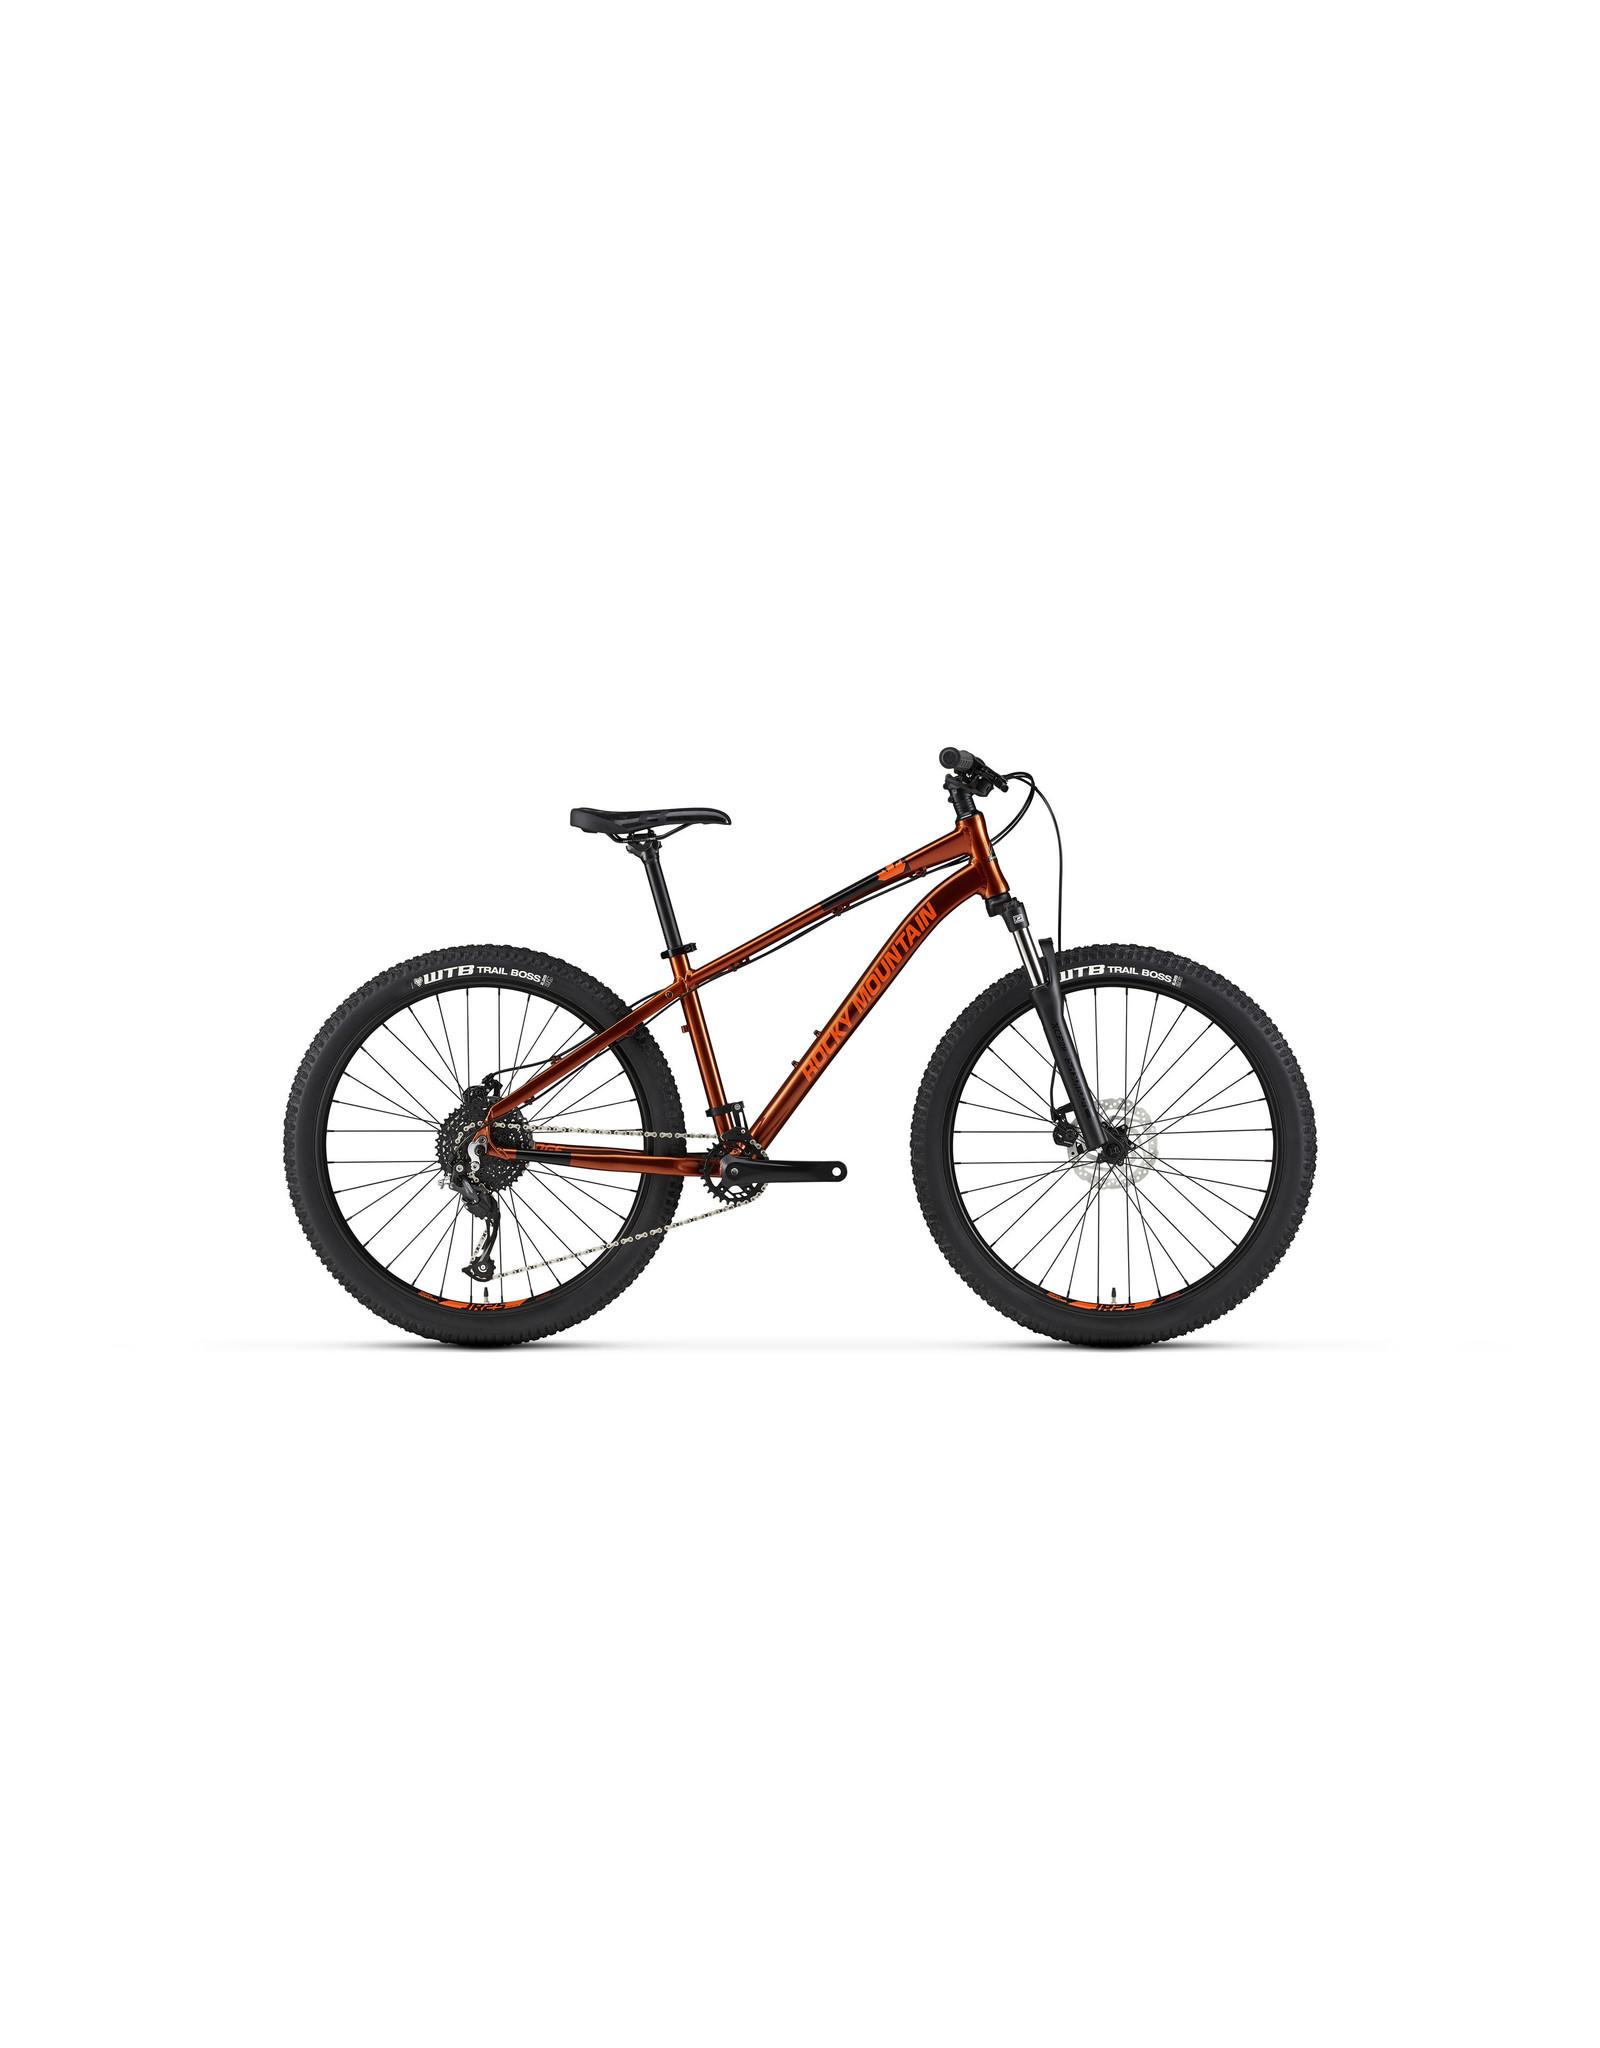 Rocky Mountain Rocky Mountain Edge Jr 26 2021